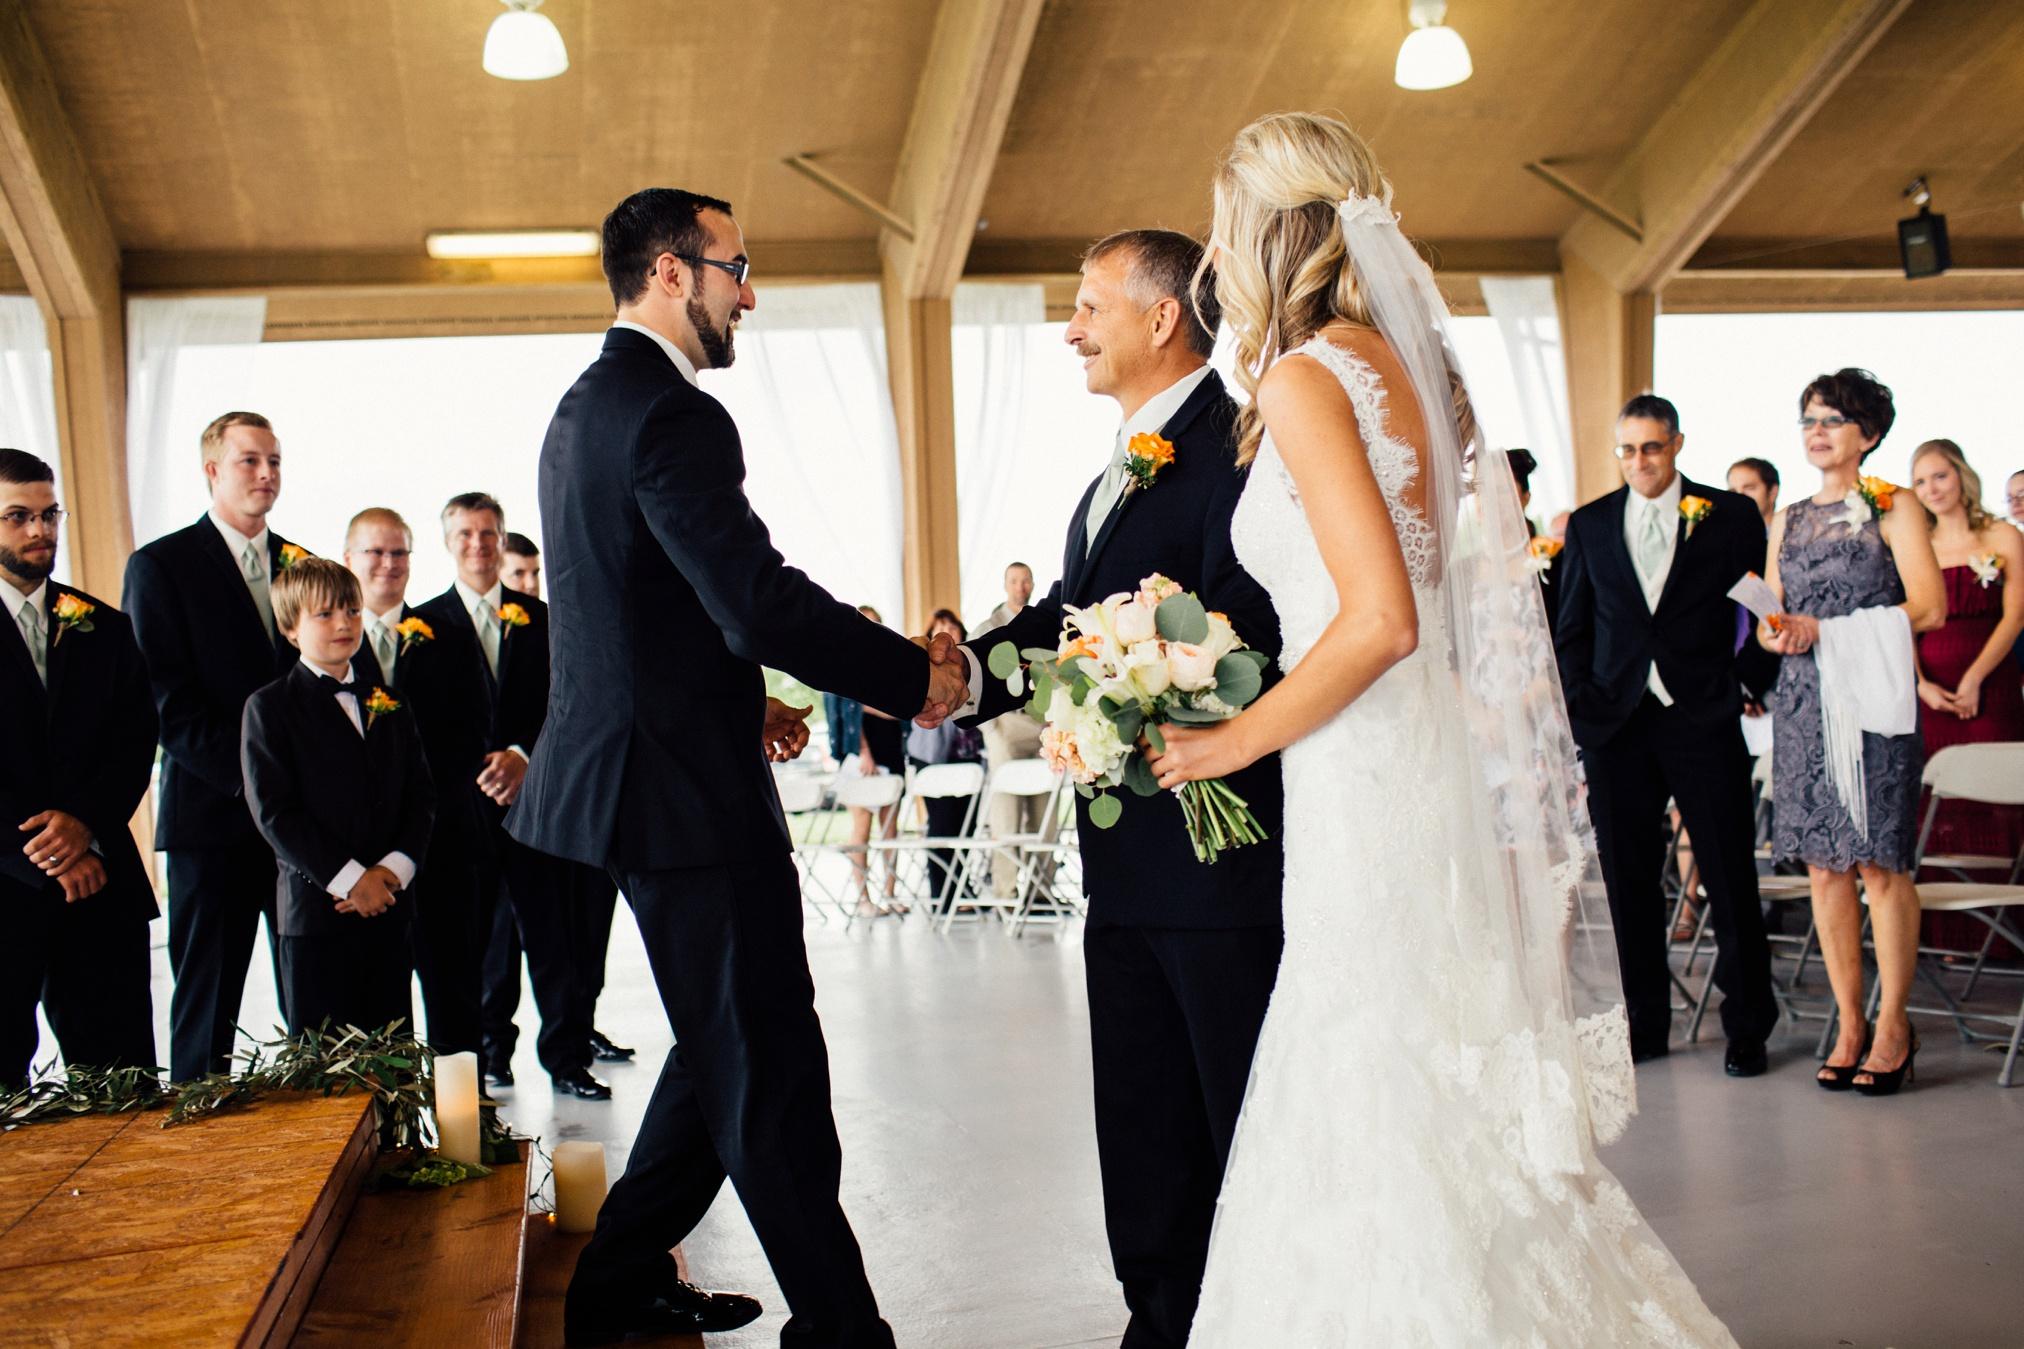 schmid_wedding-401.jpg